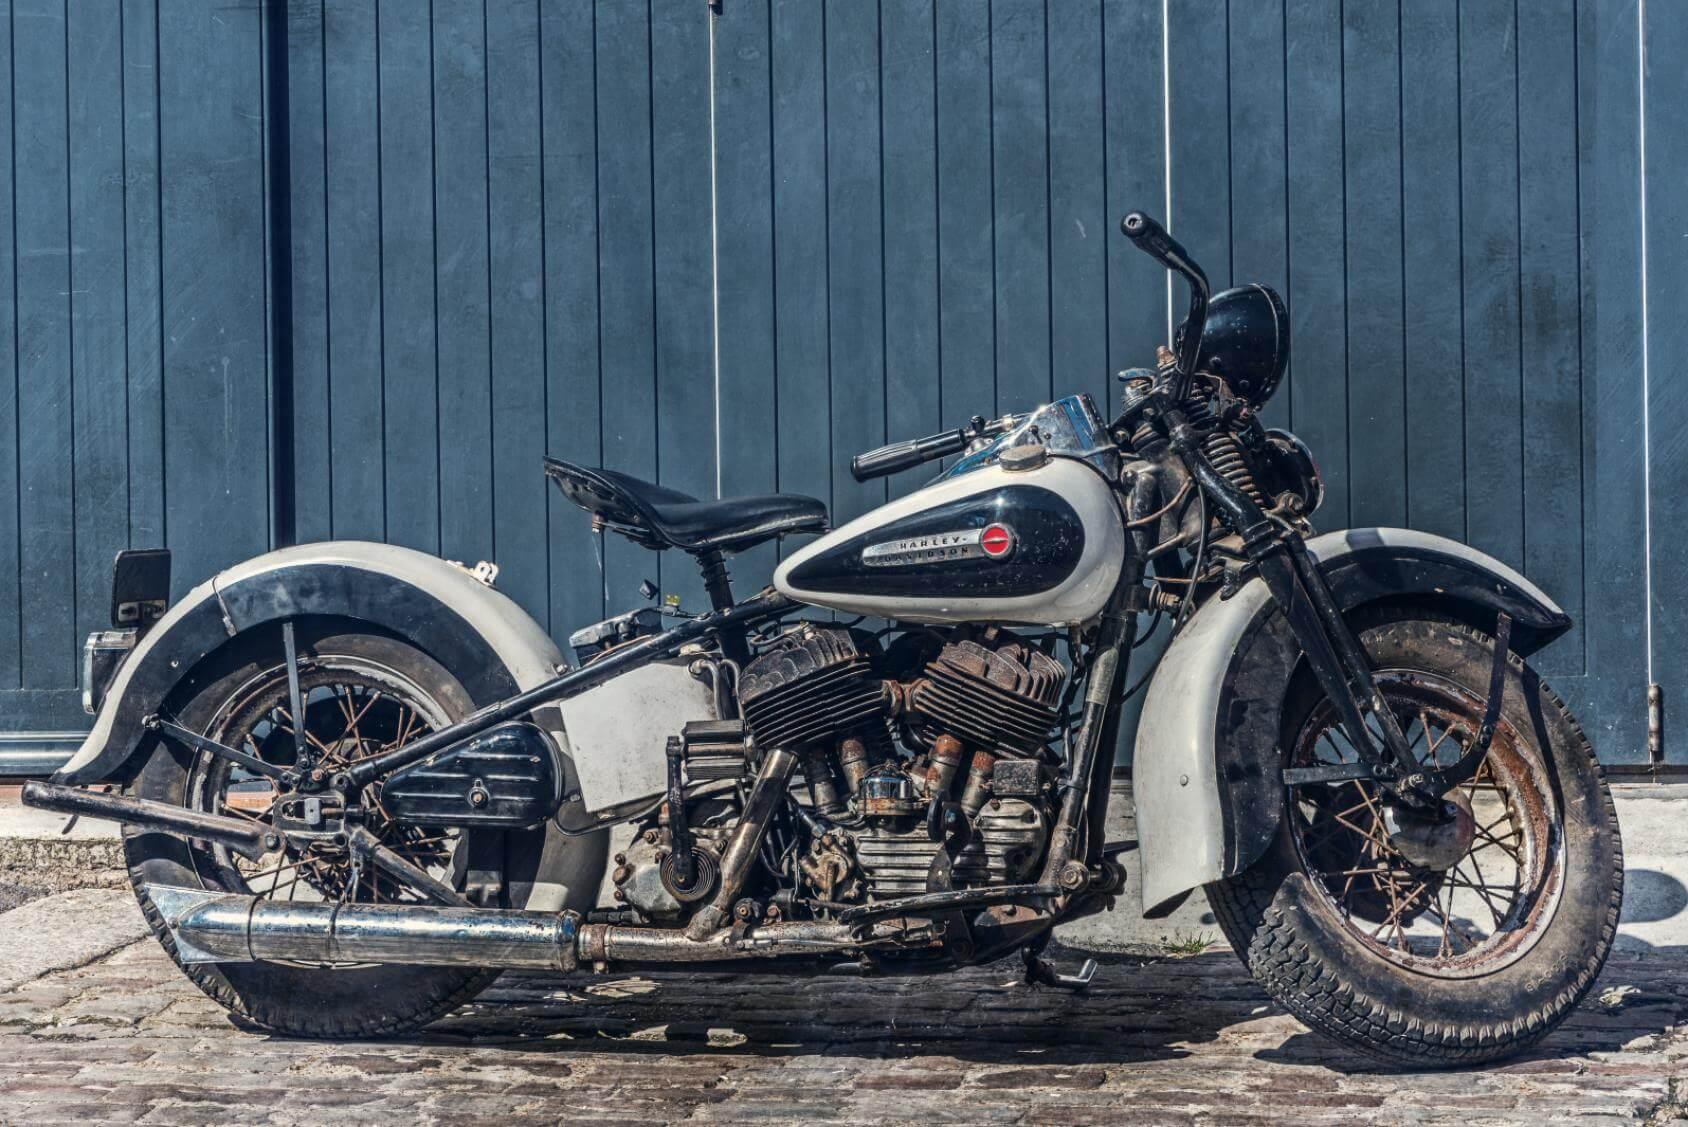 Vintage Harley Davidson Motorcycle - Original image